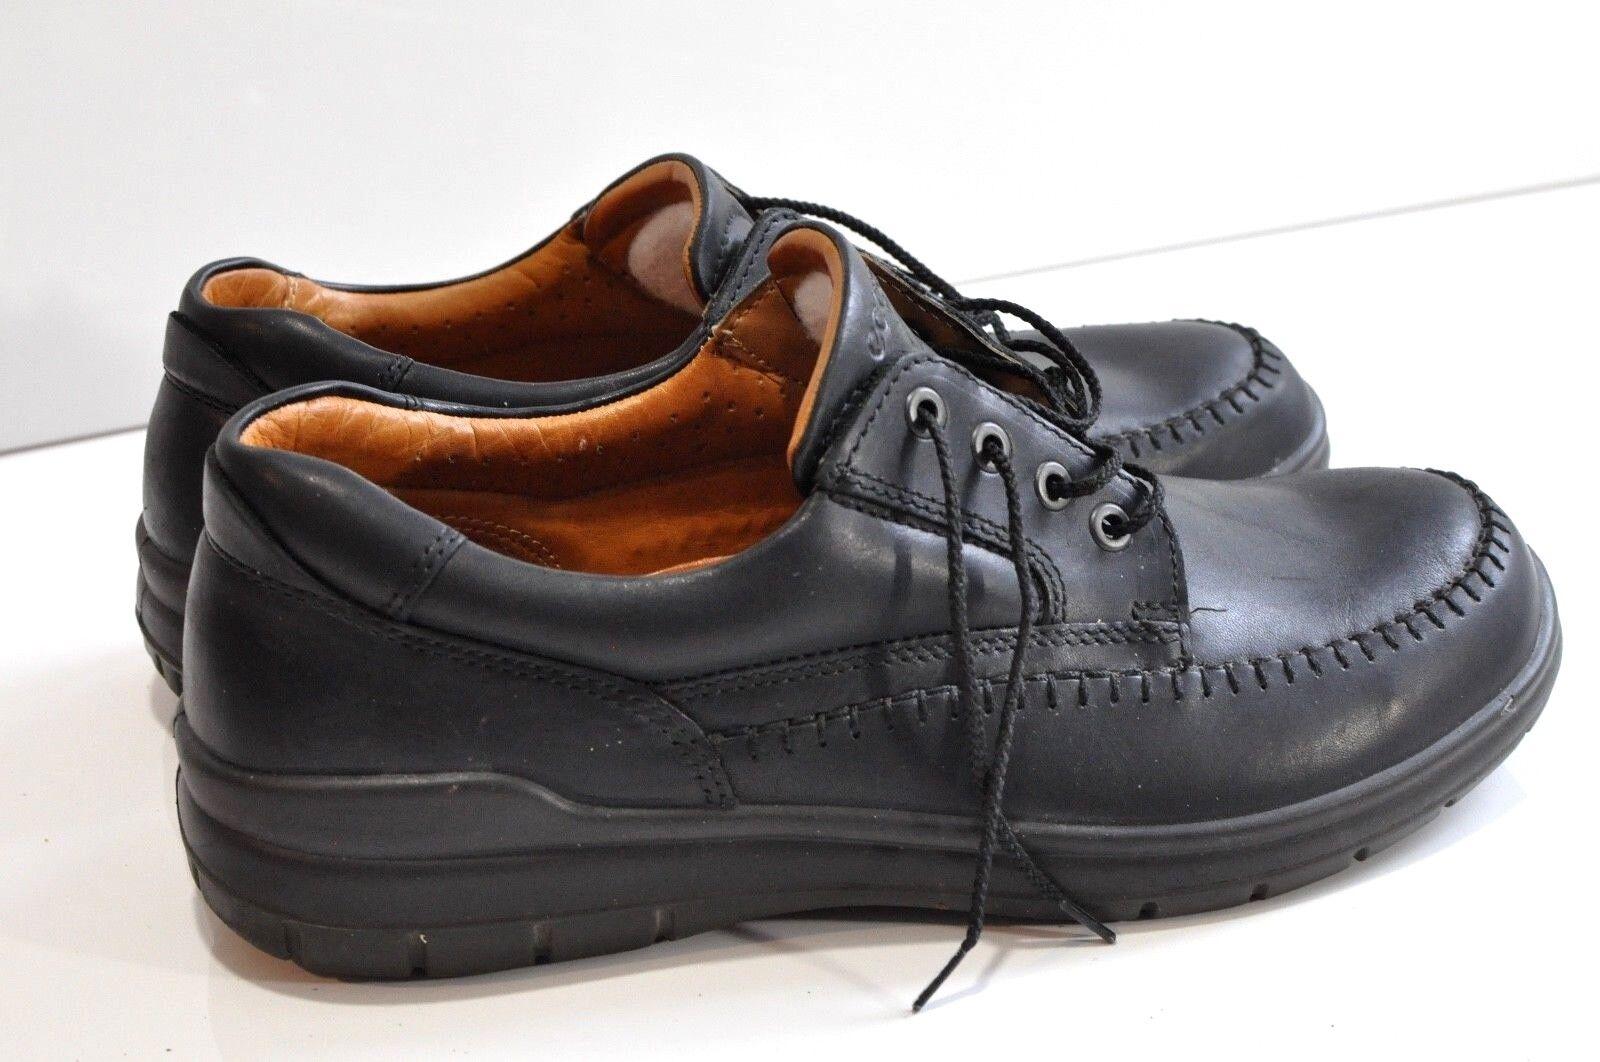 ECCO Uomo leather shoes EU 45